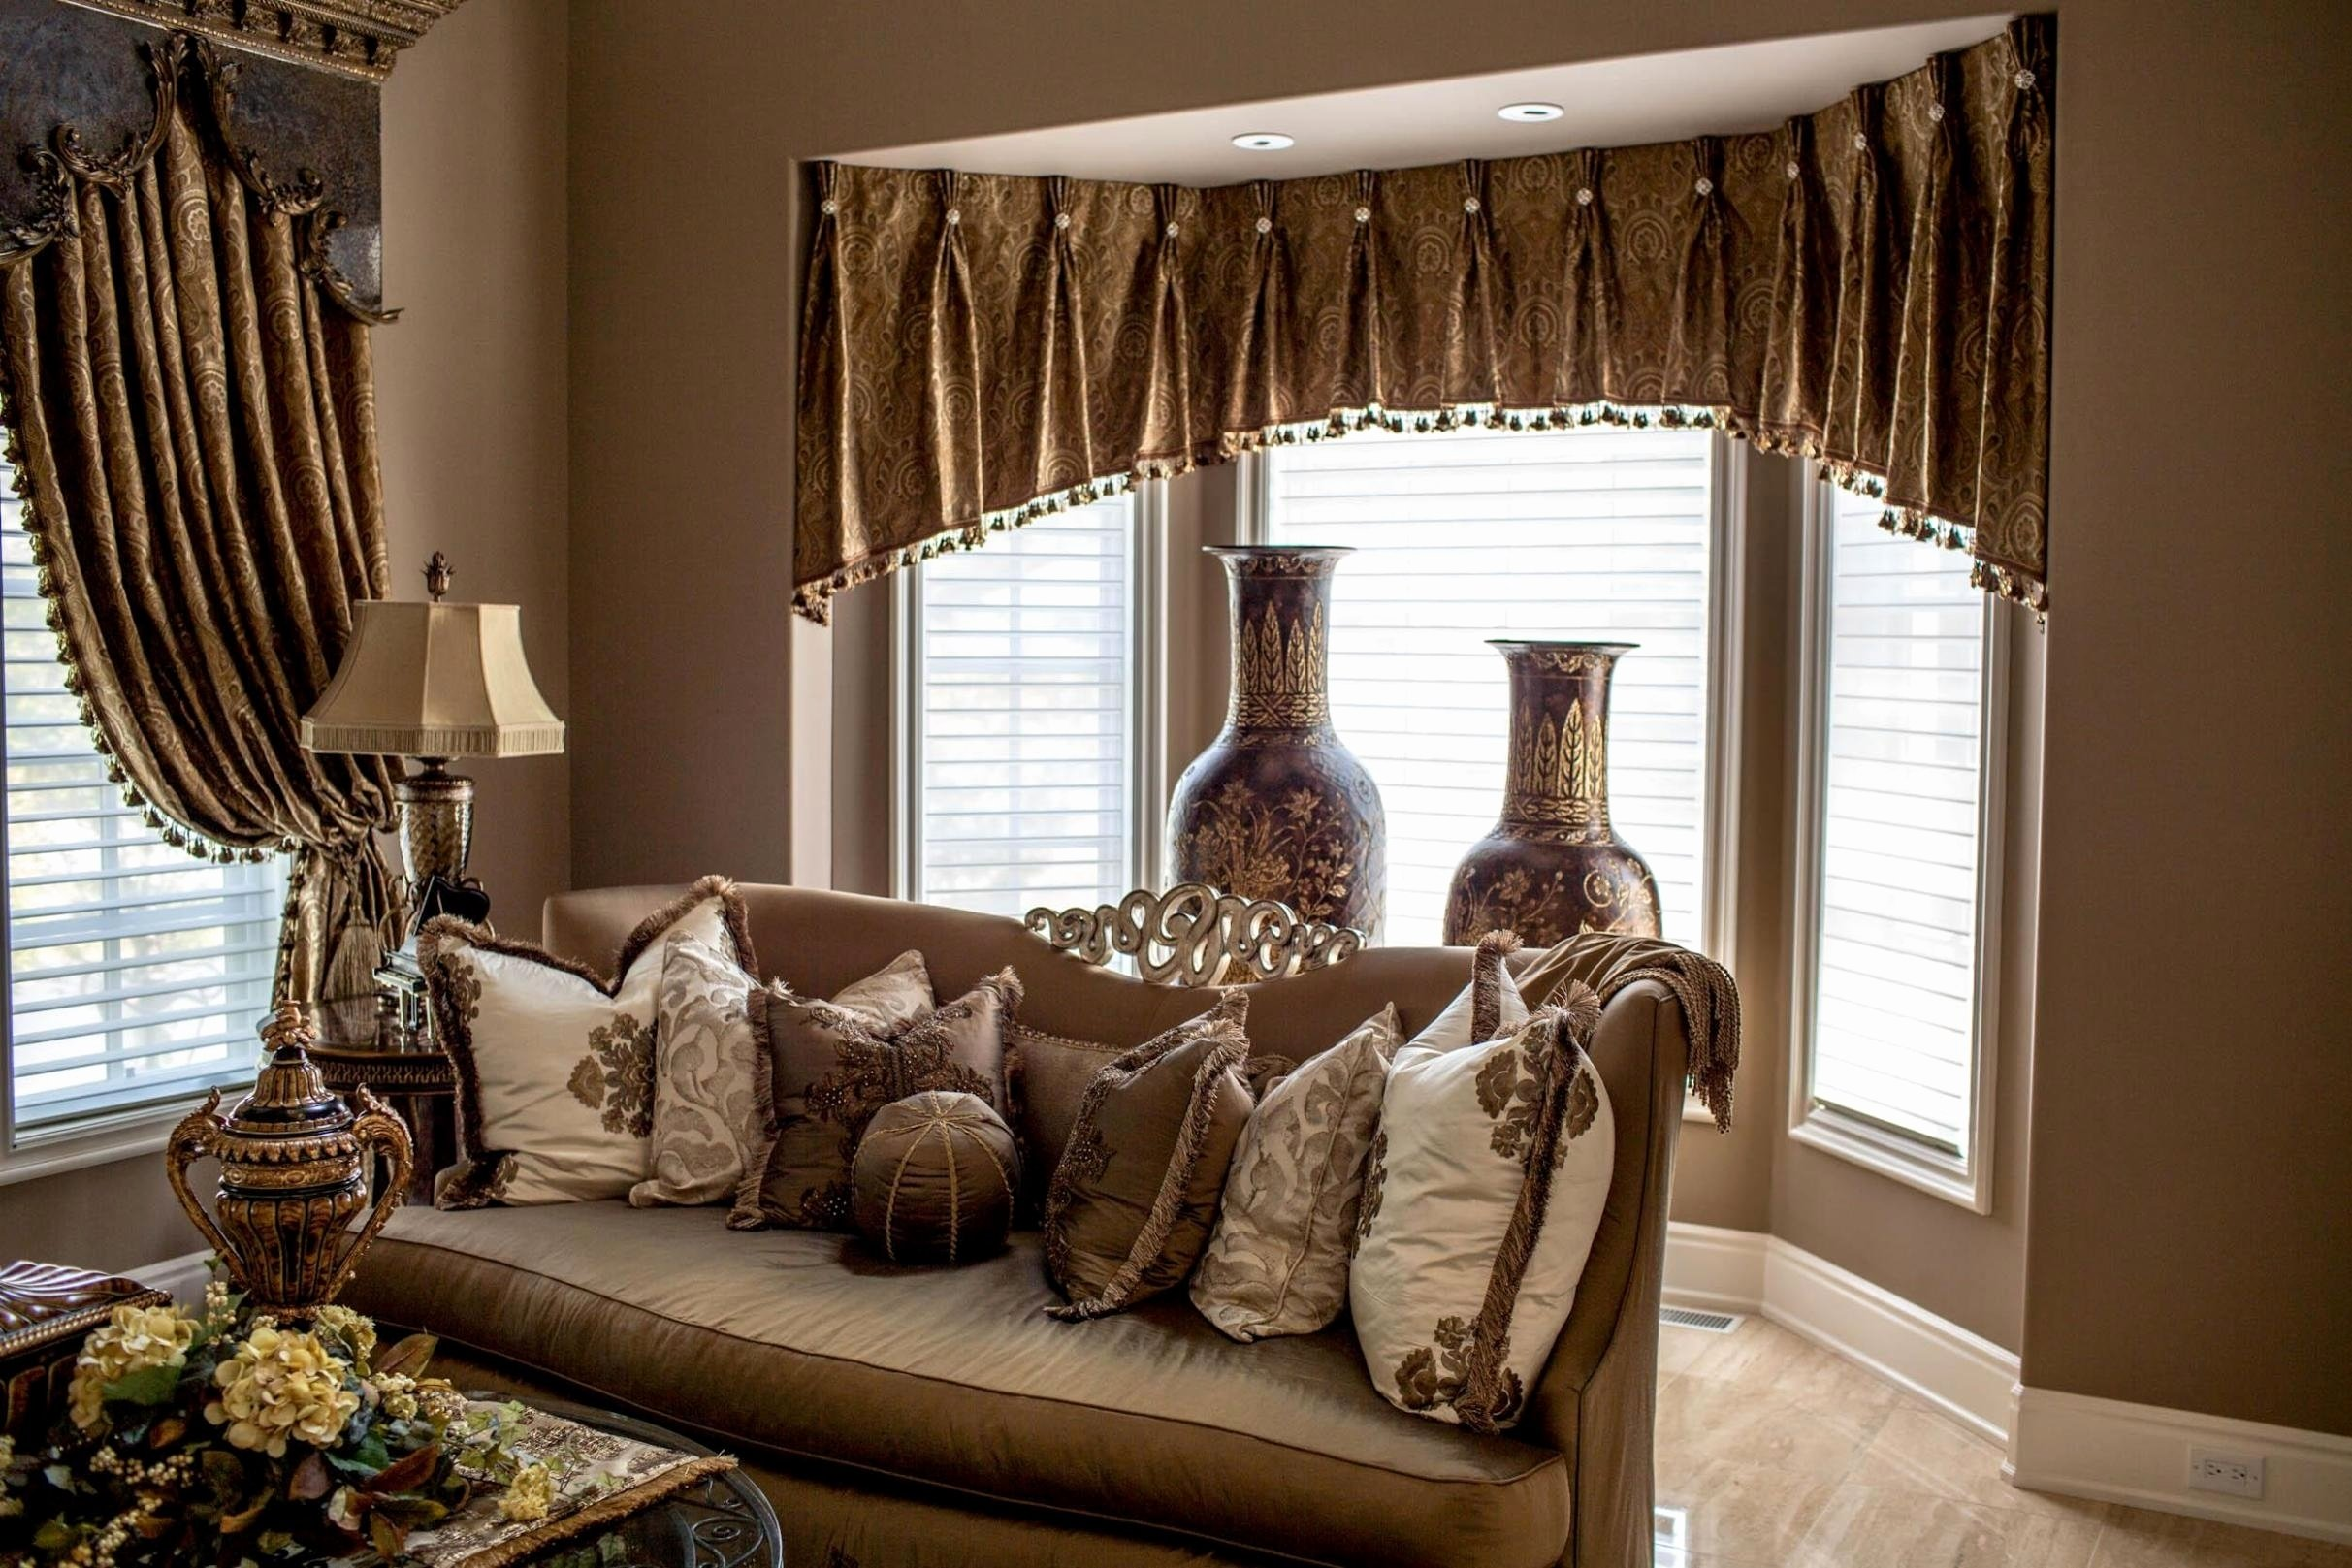 10 Spectacular Drapery Ideas For Living Room drapery ideas living room inspirational curtains gold living room 2020